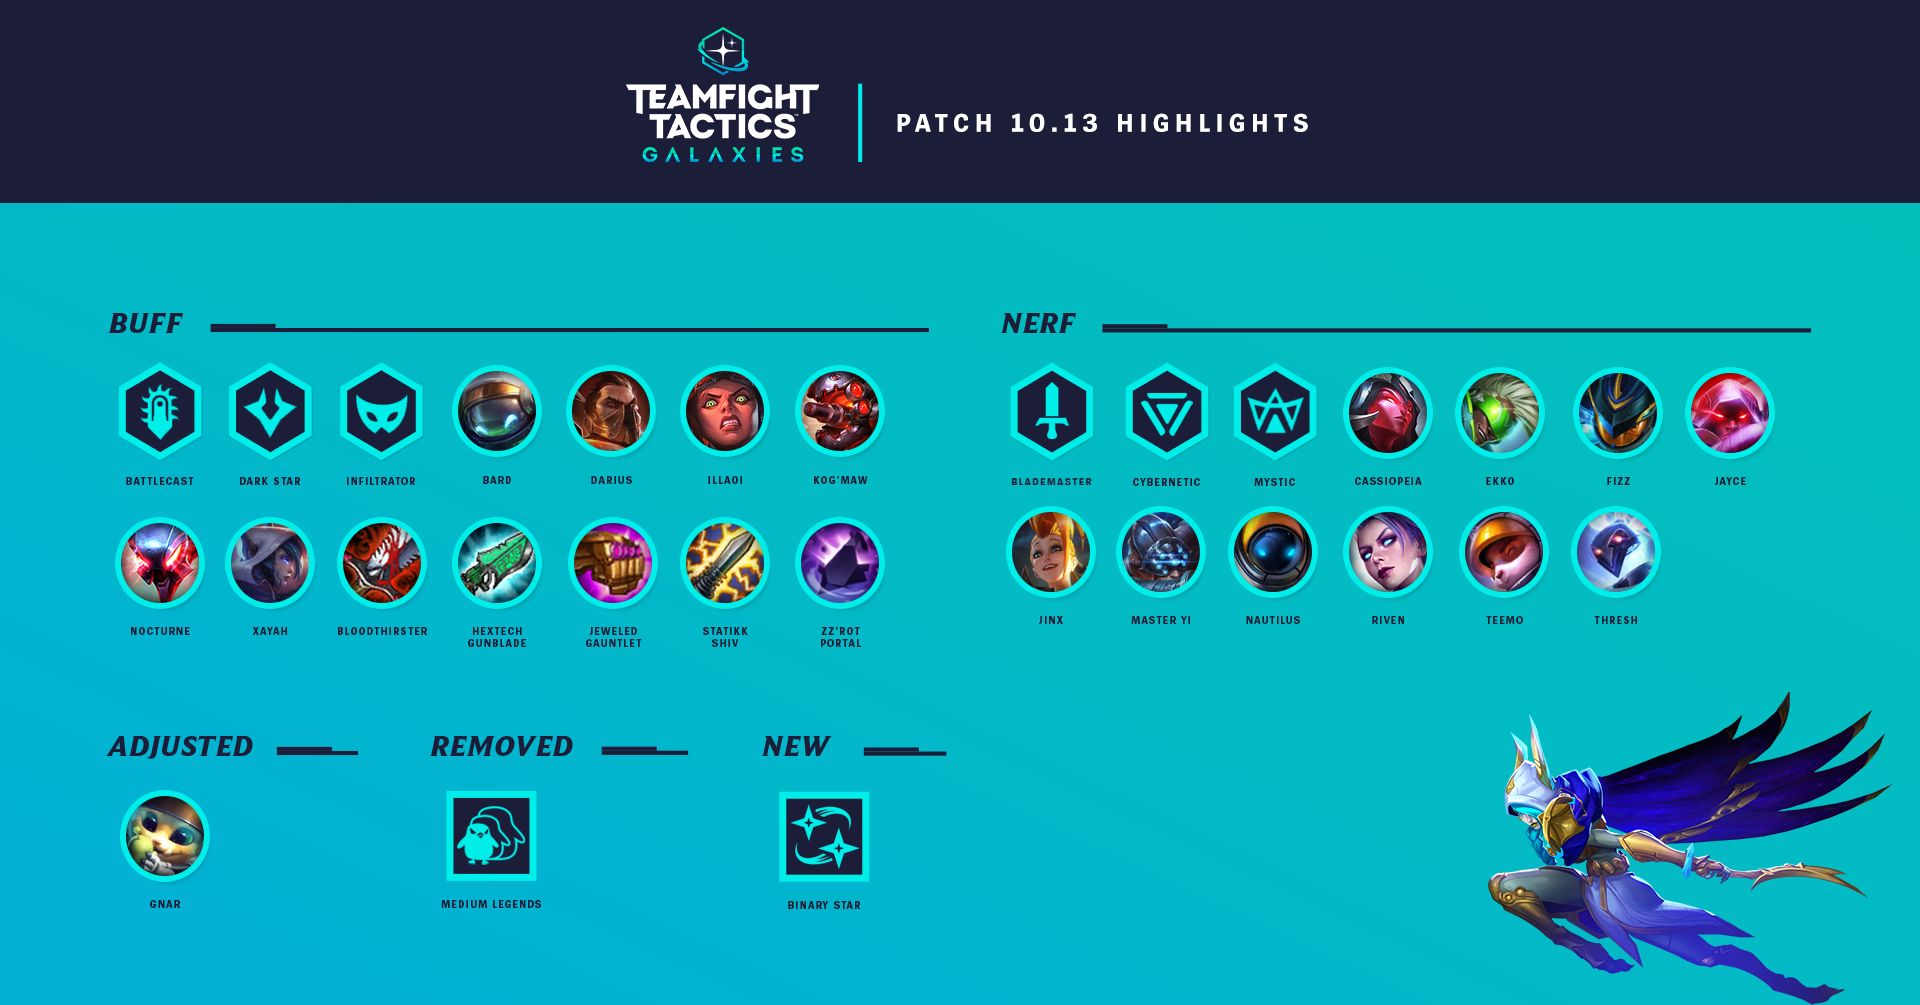 Teamfight Tactics 10.18 yama notları yayınlandı